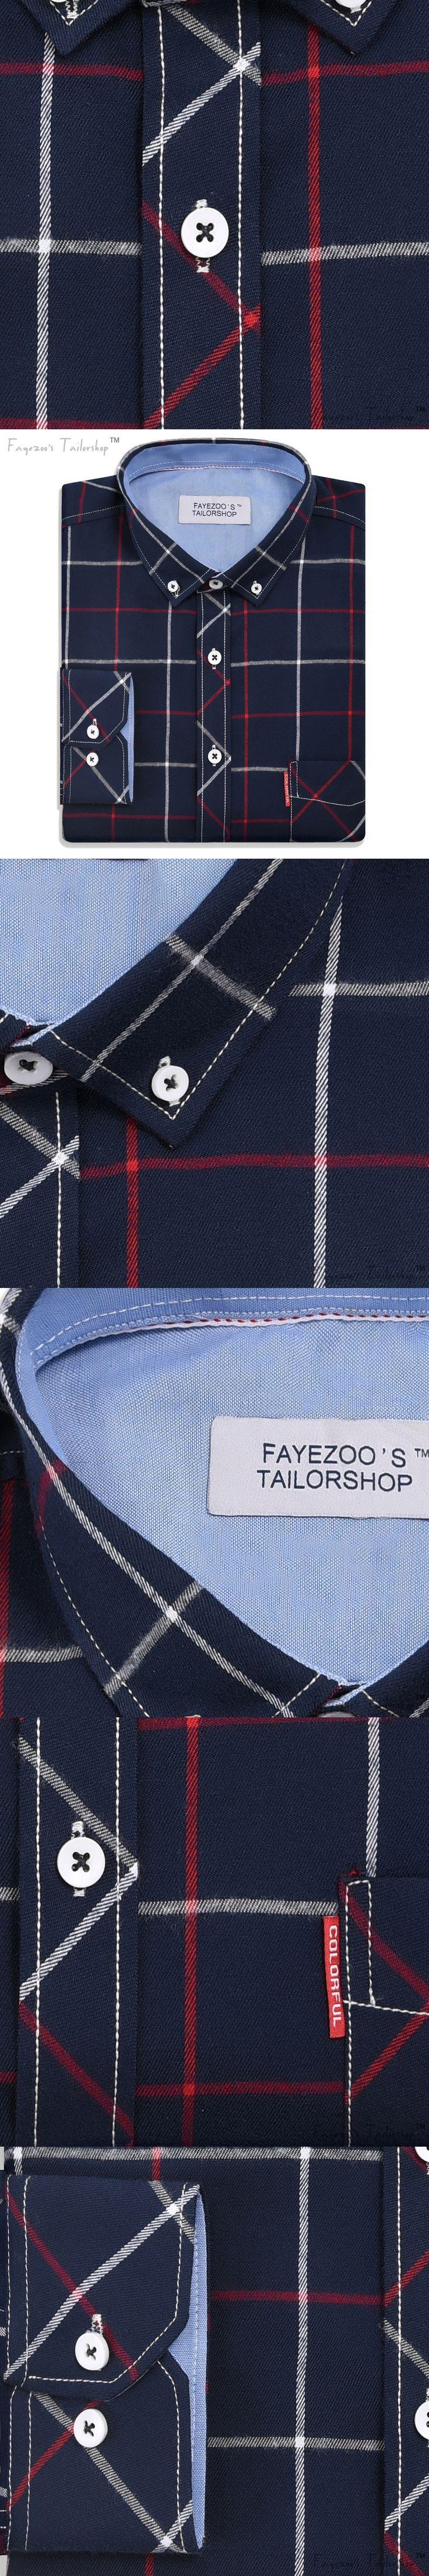 Cotton Flannel Plaid Korean Designer Slim Fit Long Sleeve Casual Shirt for Men - Evil